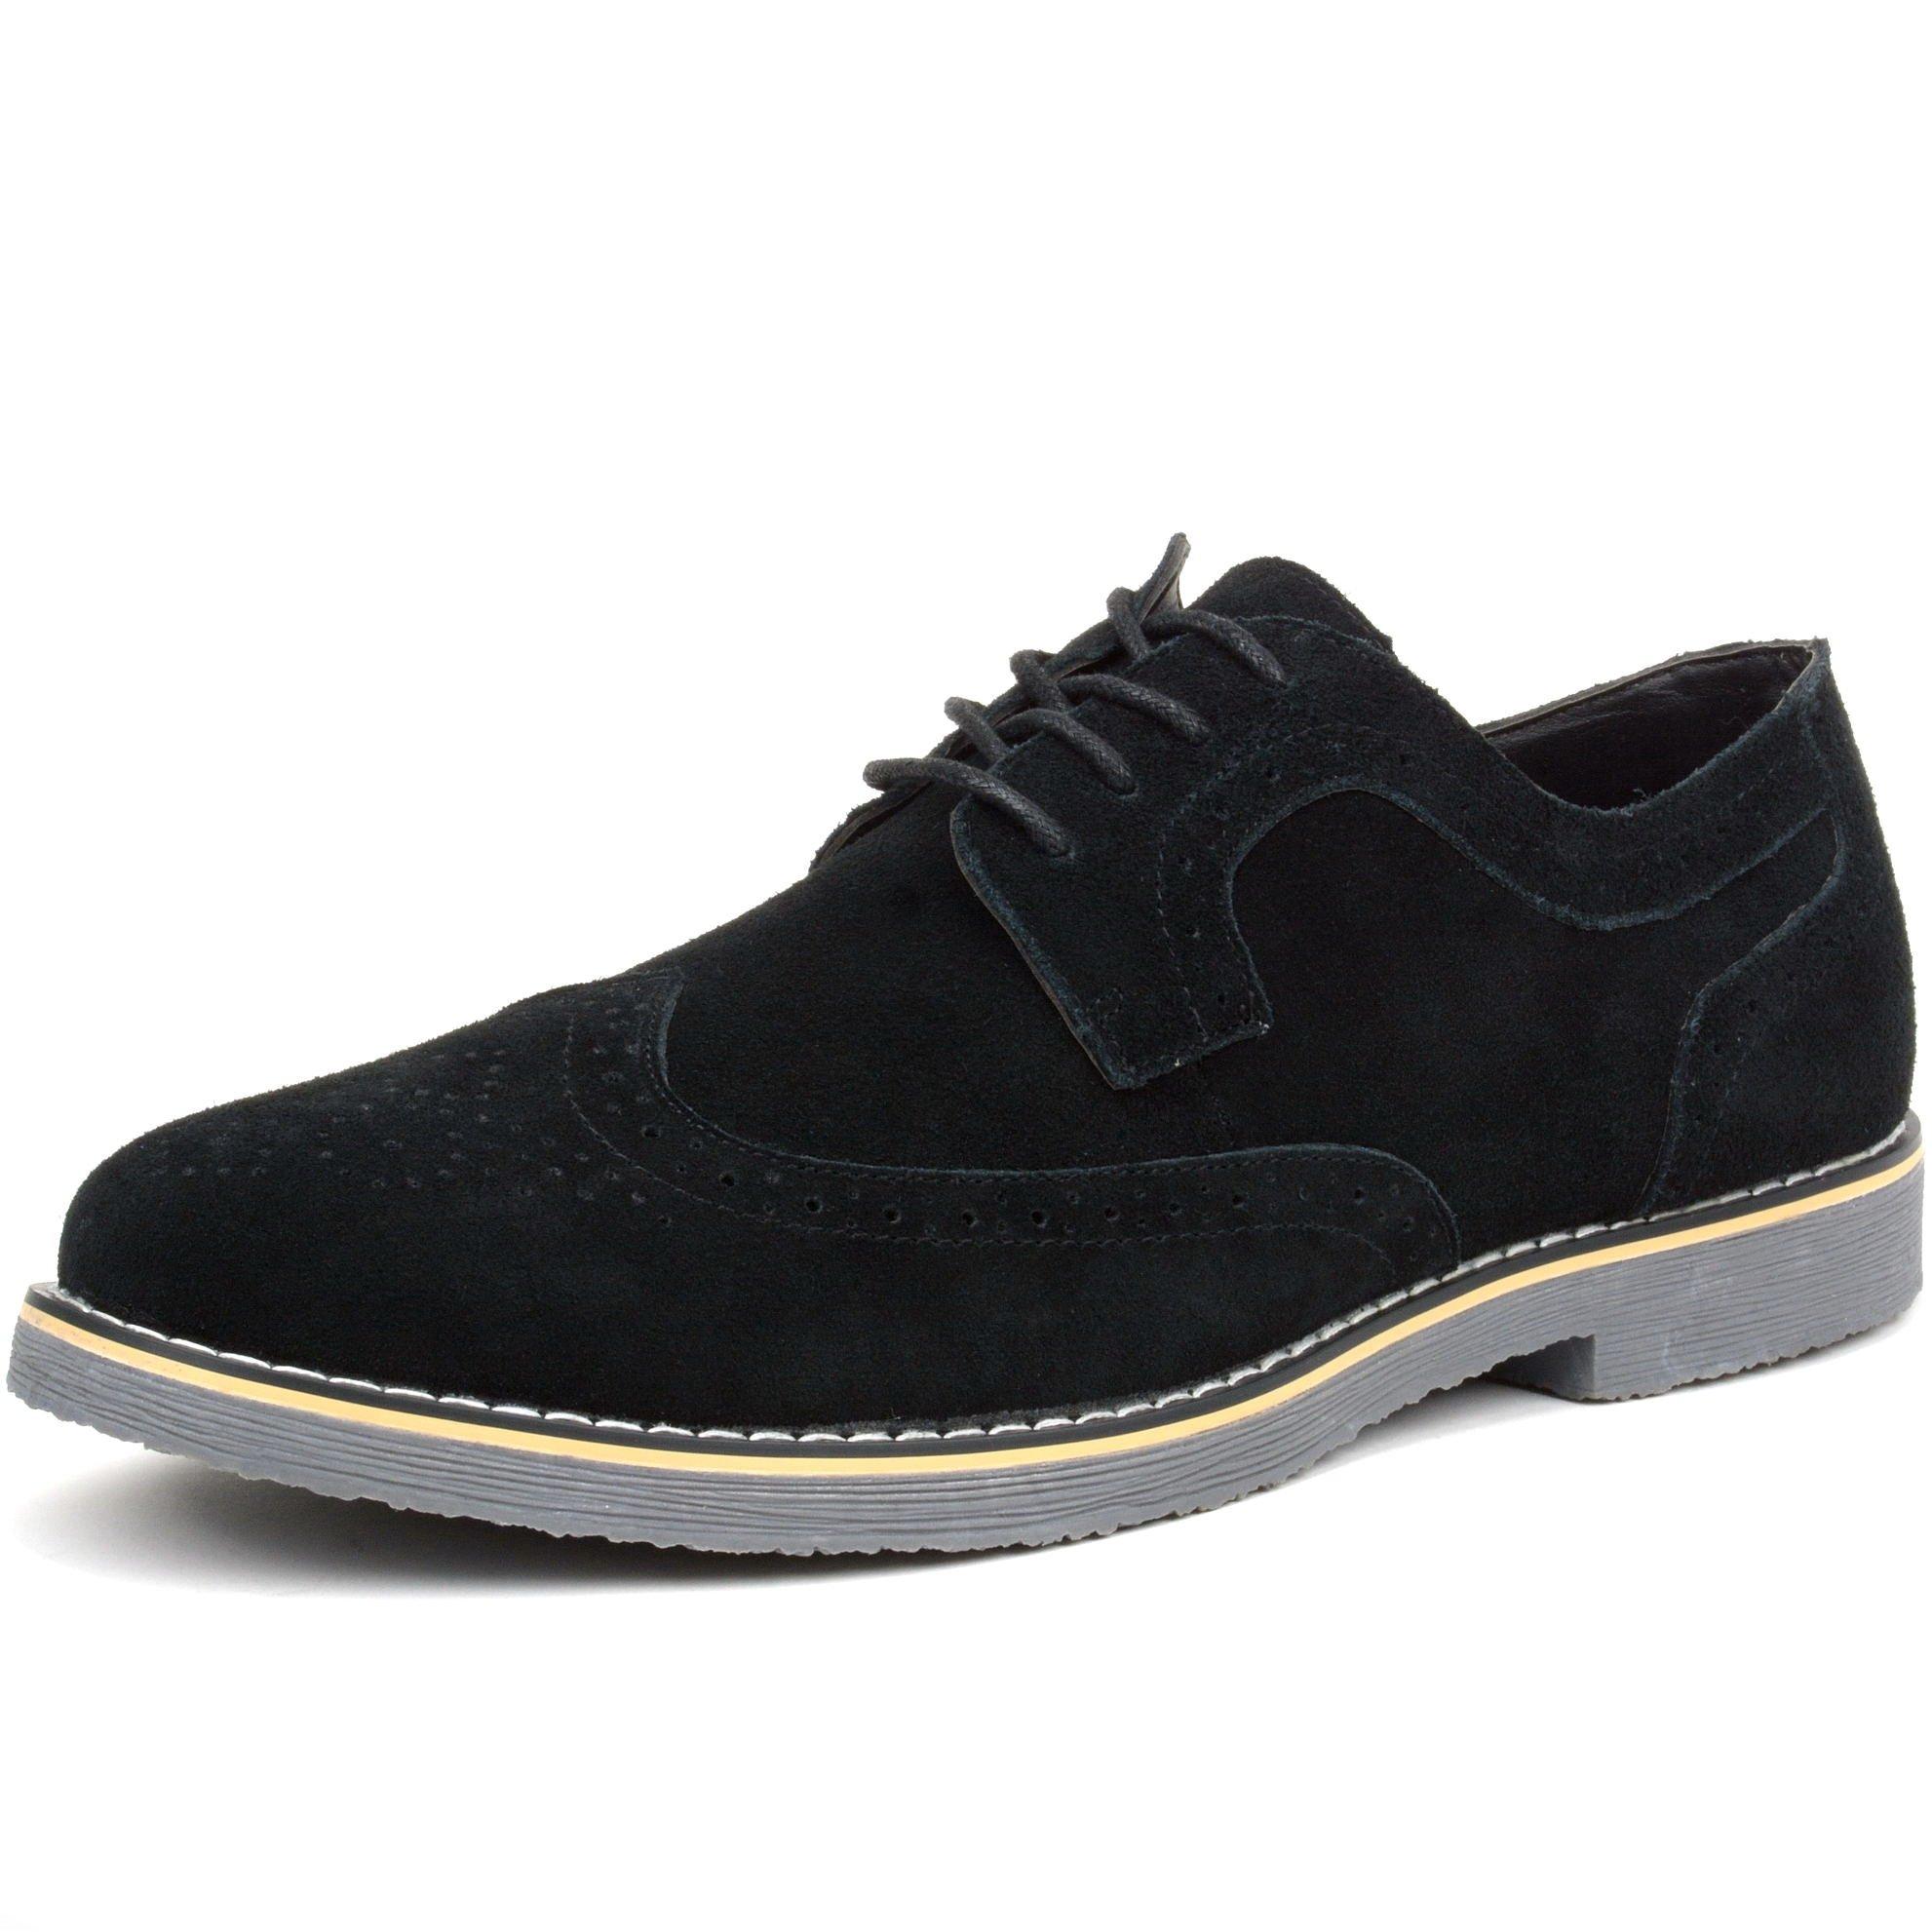 alpine swiss Beau Mens Dress Shoes Genuine Suede Wing Tip Oxfords Black 12 M US